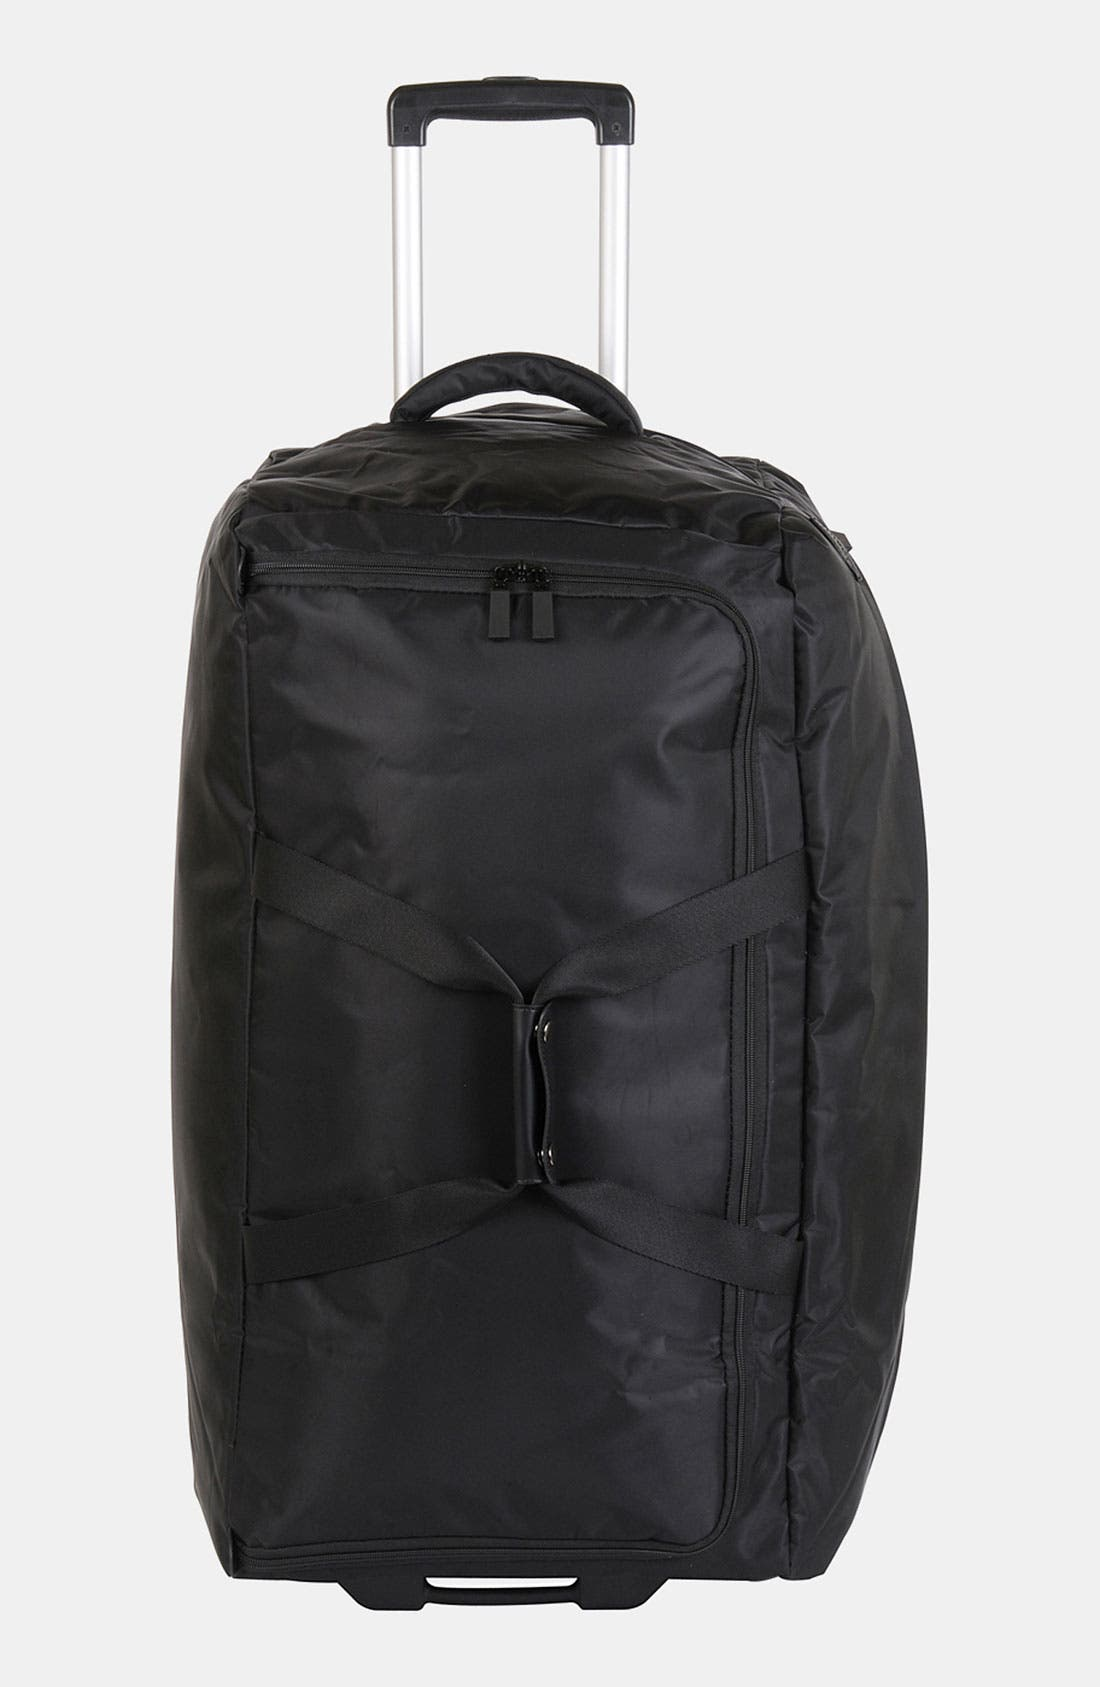 Foldable Rolling Duffel Bag,                             Main thumbnail 1, color,                             001